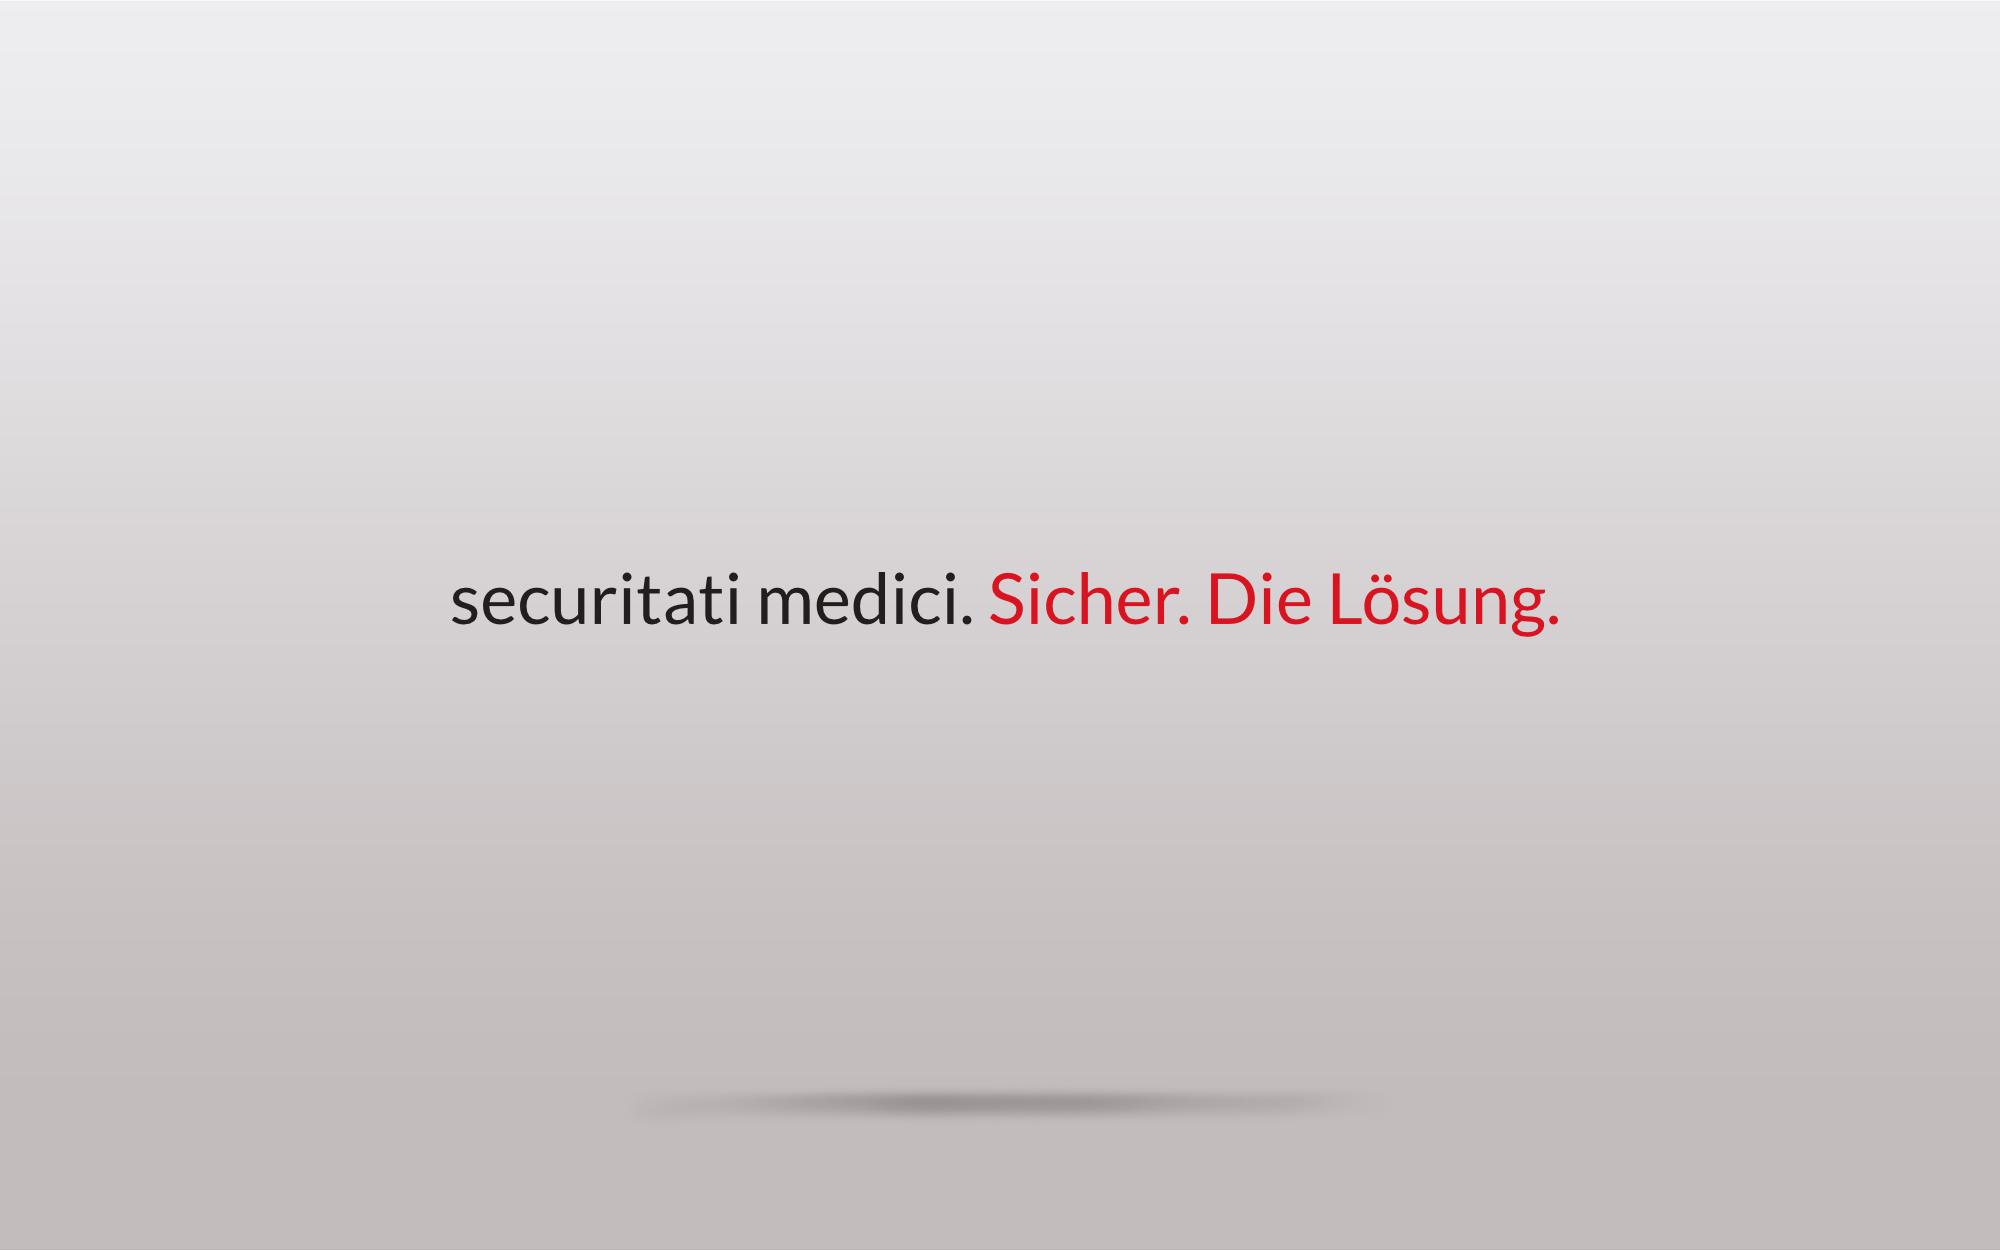 securitati medici - Claim